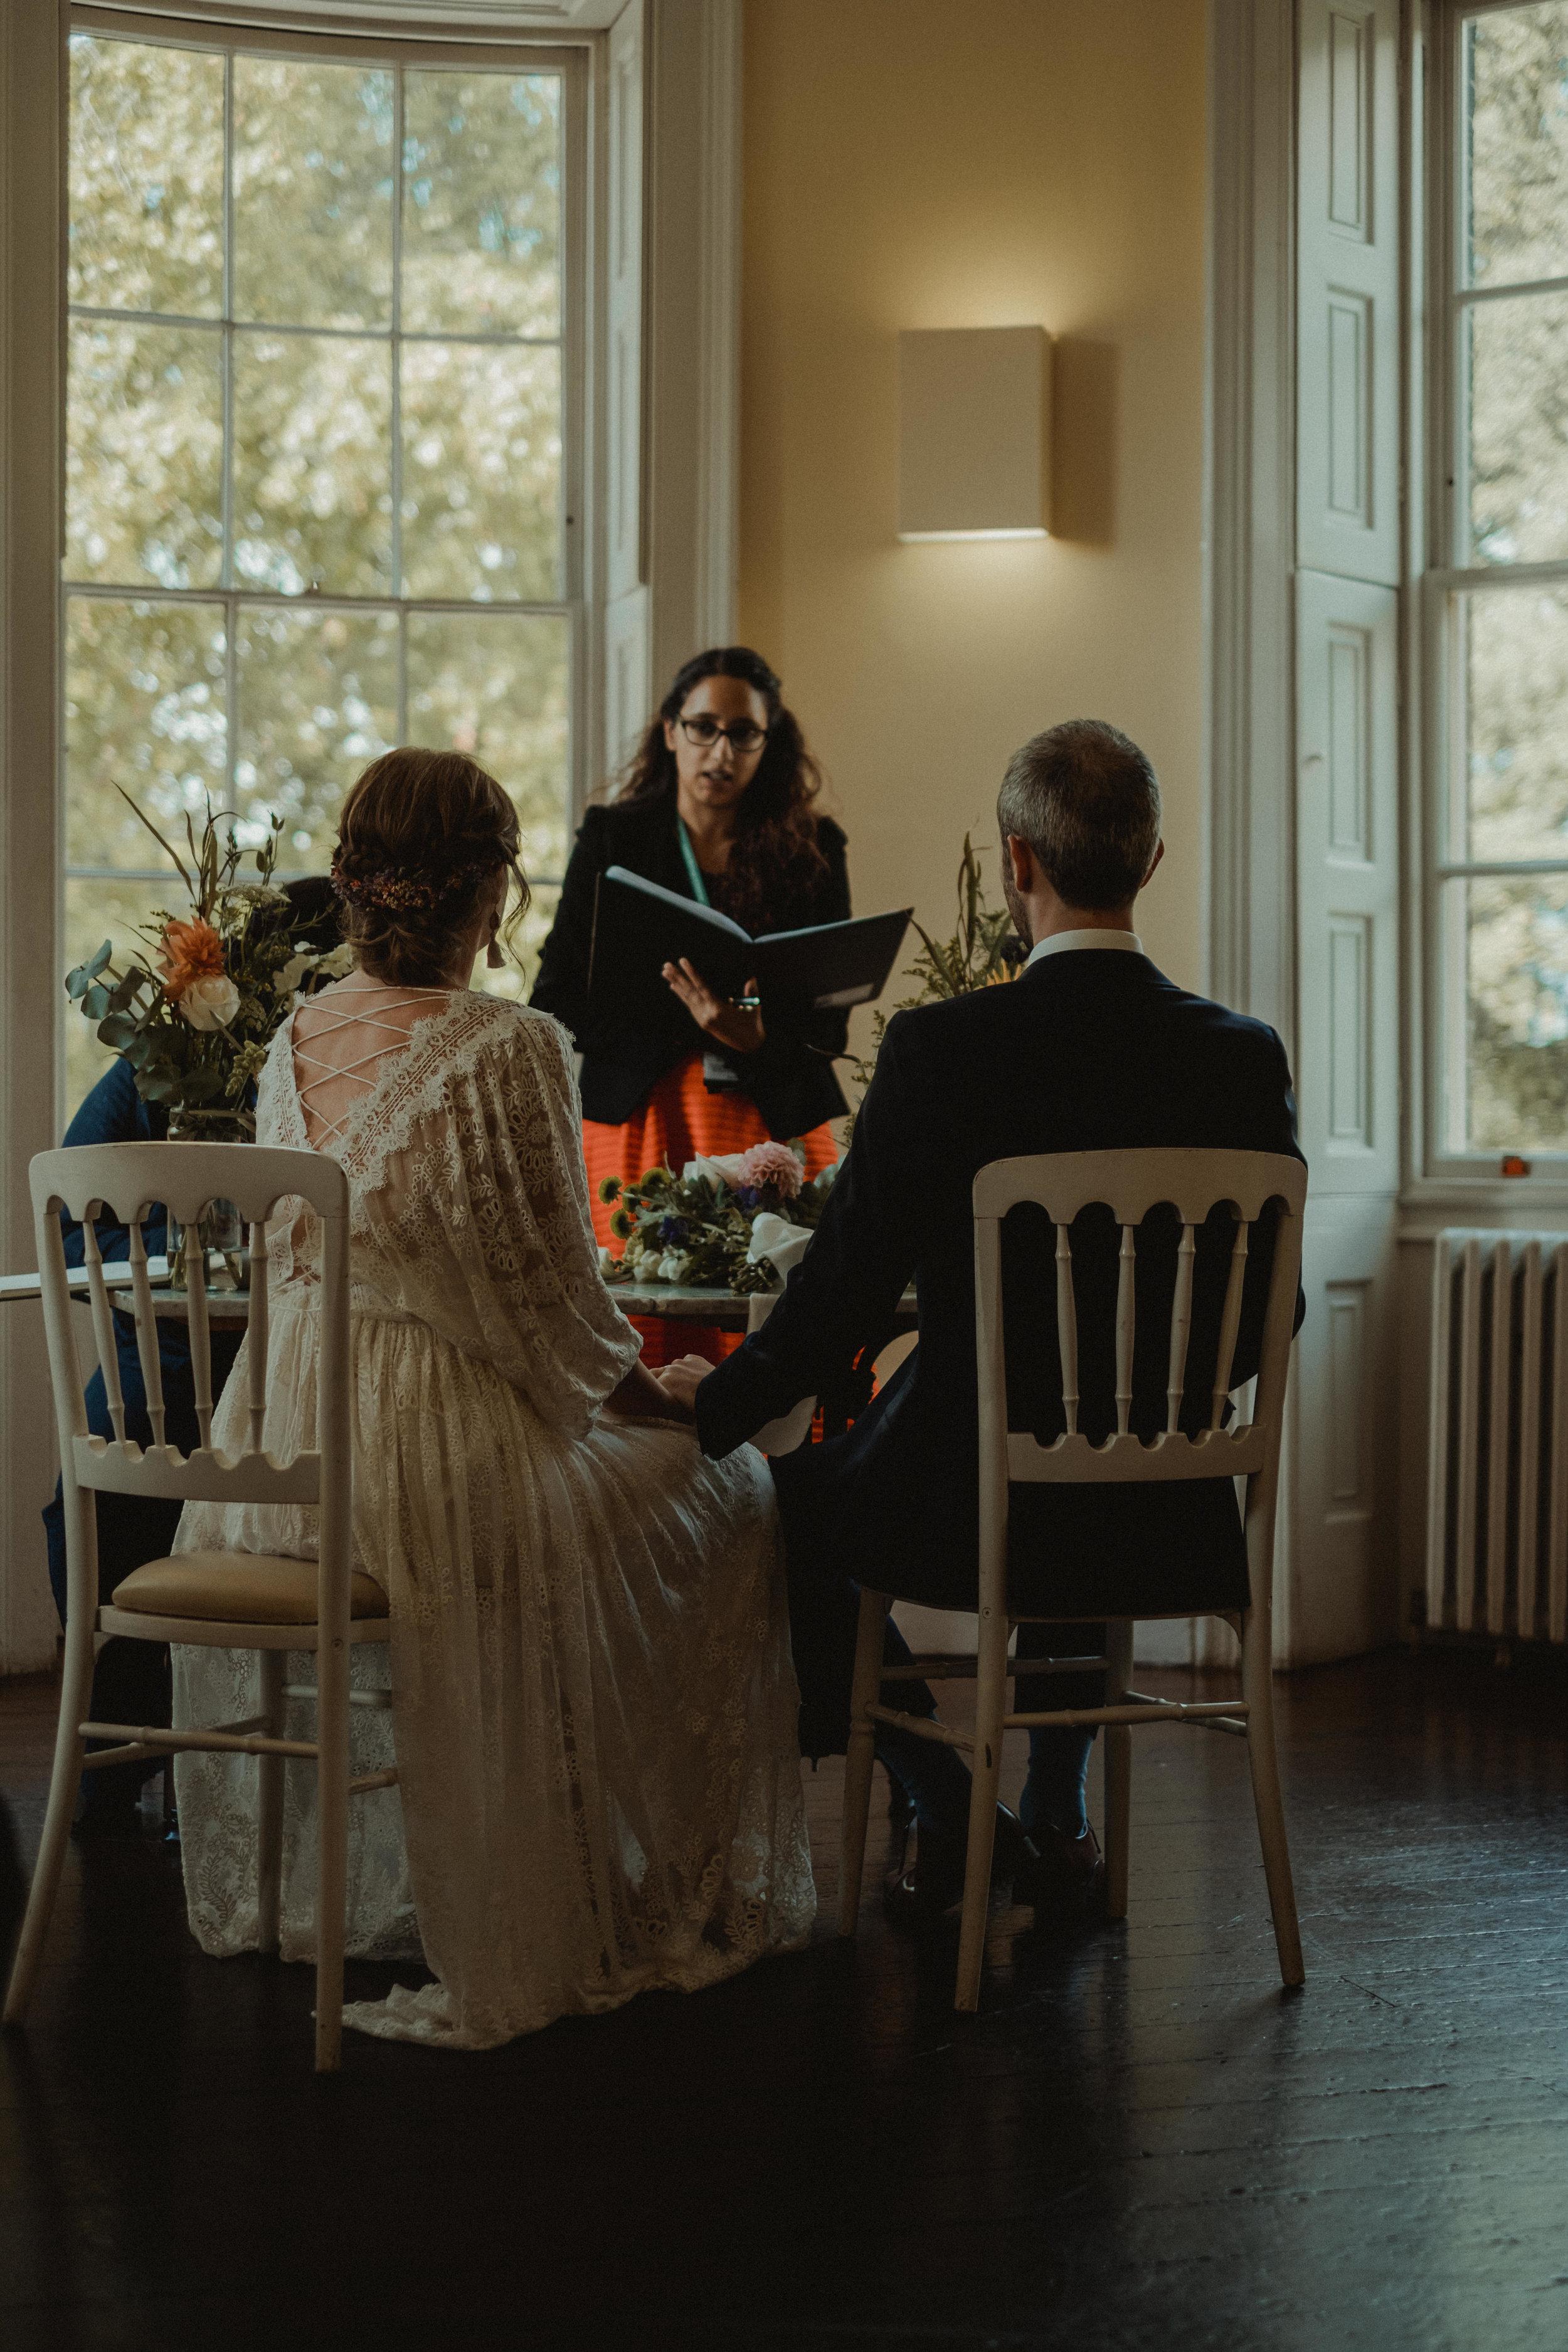 Leanne-London-Bespoke-Backless-Slip-Susanna-Greening-Designs-Matlock-Derbyshire-Wedding-Dress-9